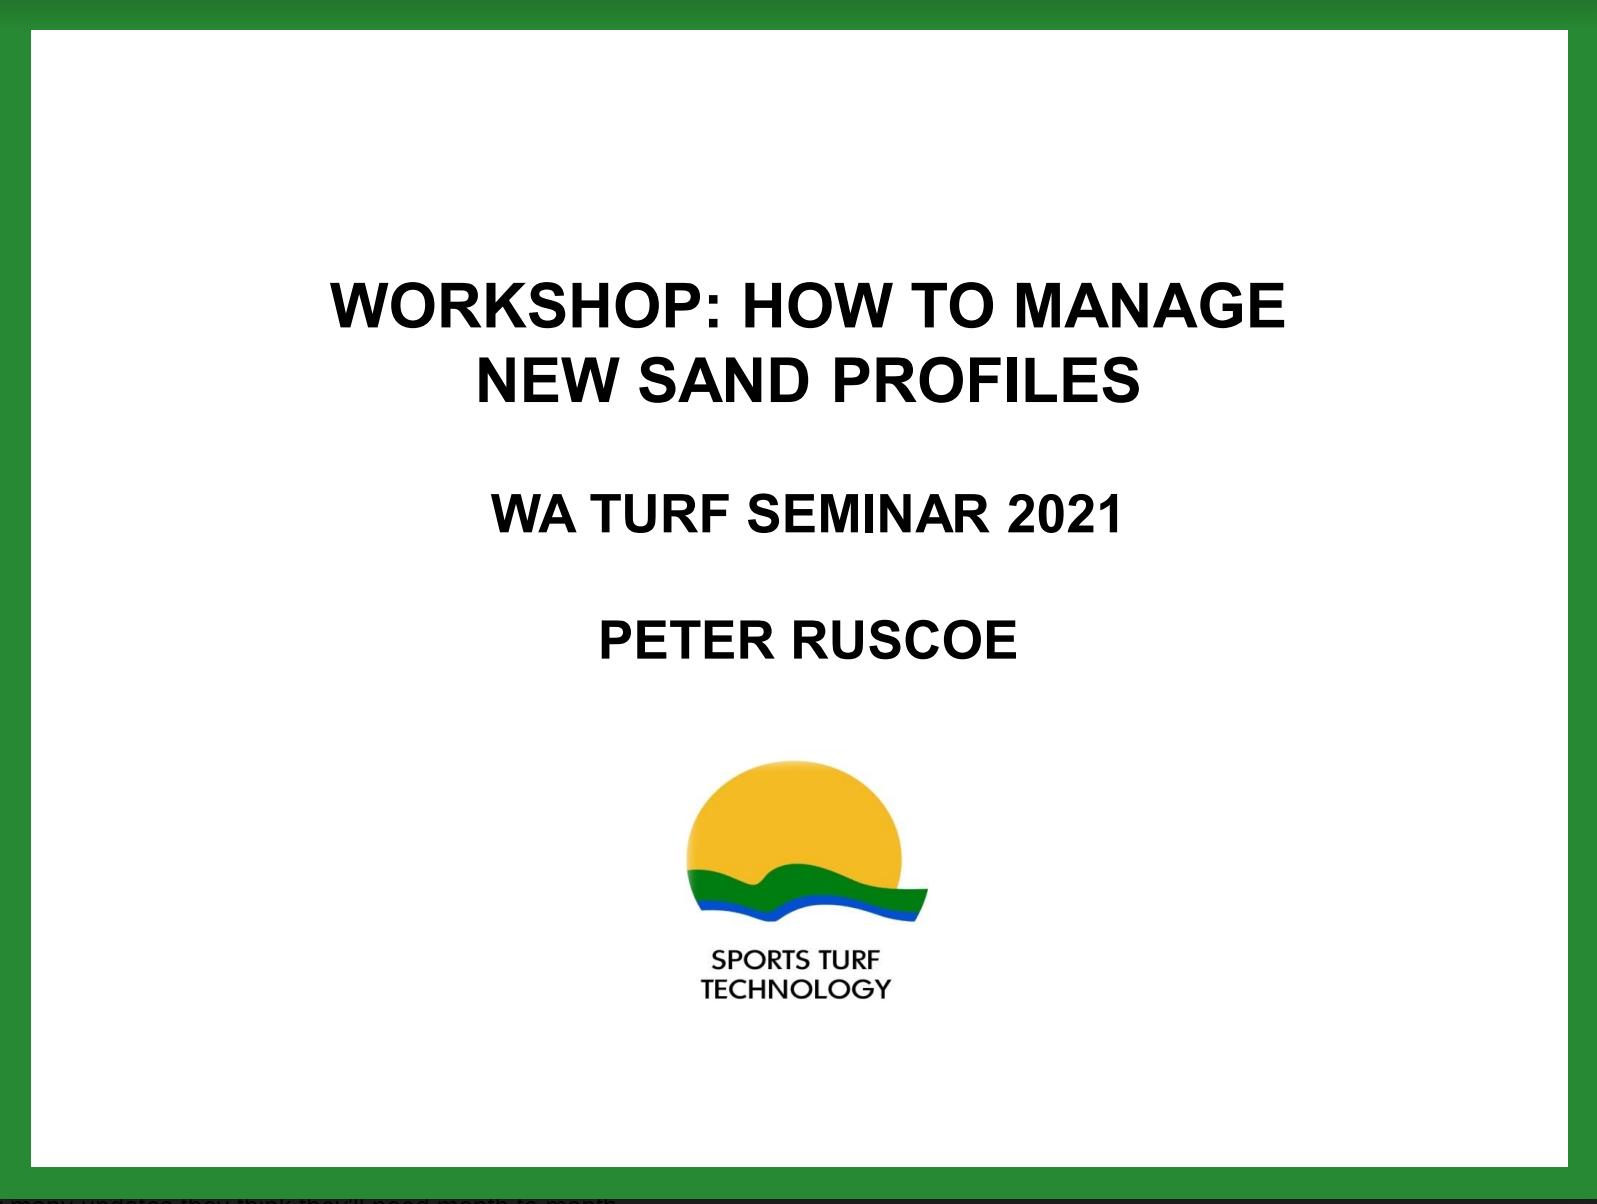 Seminar and Workshop Presentations